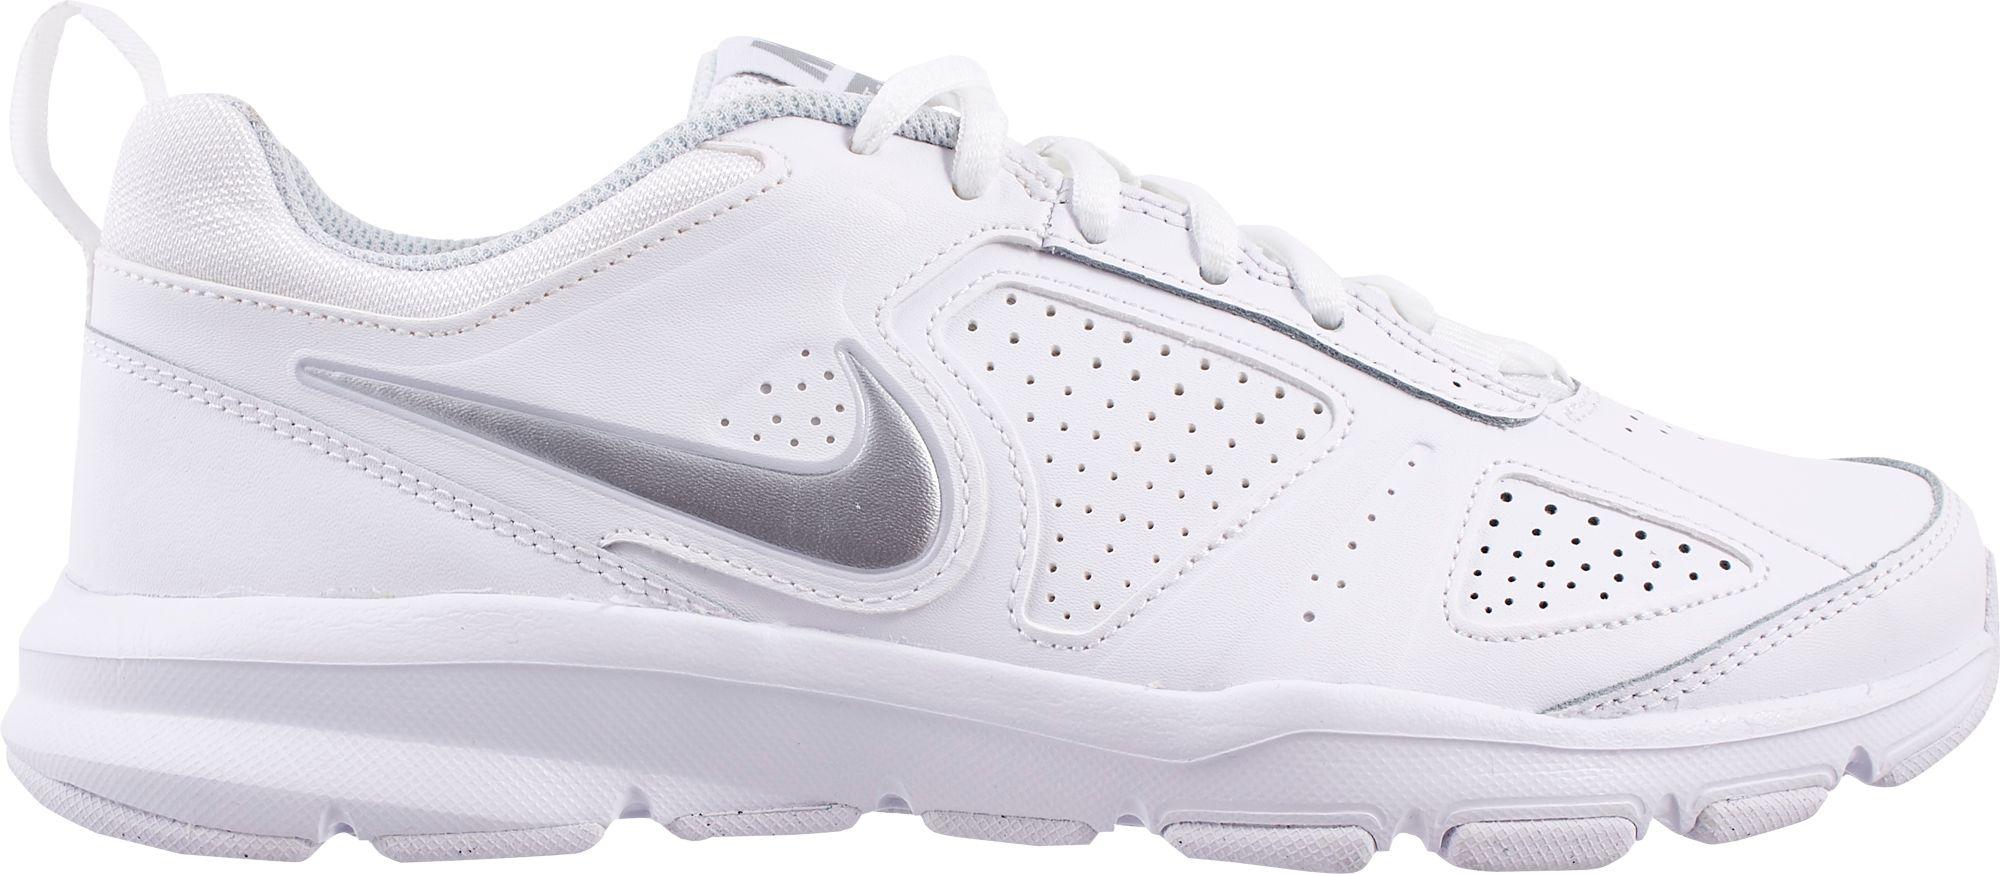 Nike trainers t lite xi women s sneakers sports runing shoes black - Nike Women S T Lite Xi Training Shoes 0 00 0 00 0 00 Noimagefound